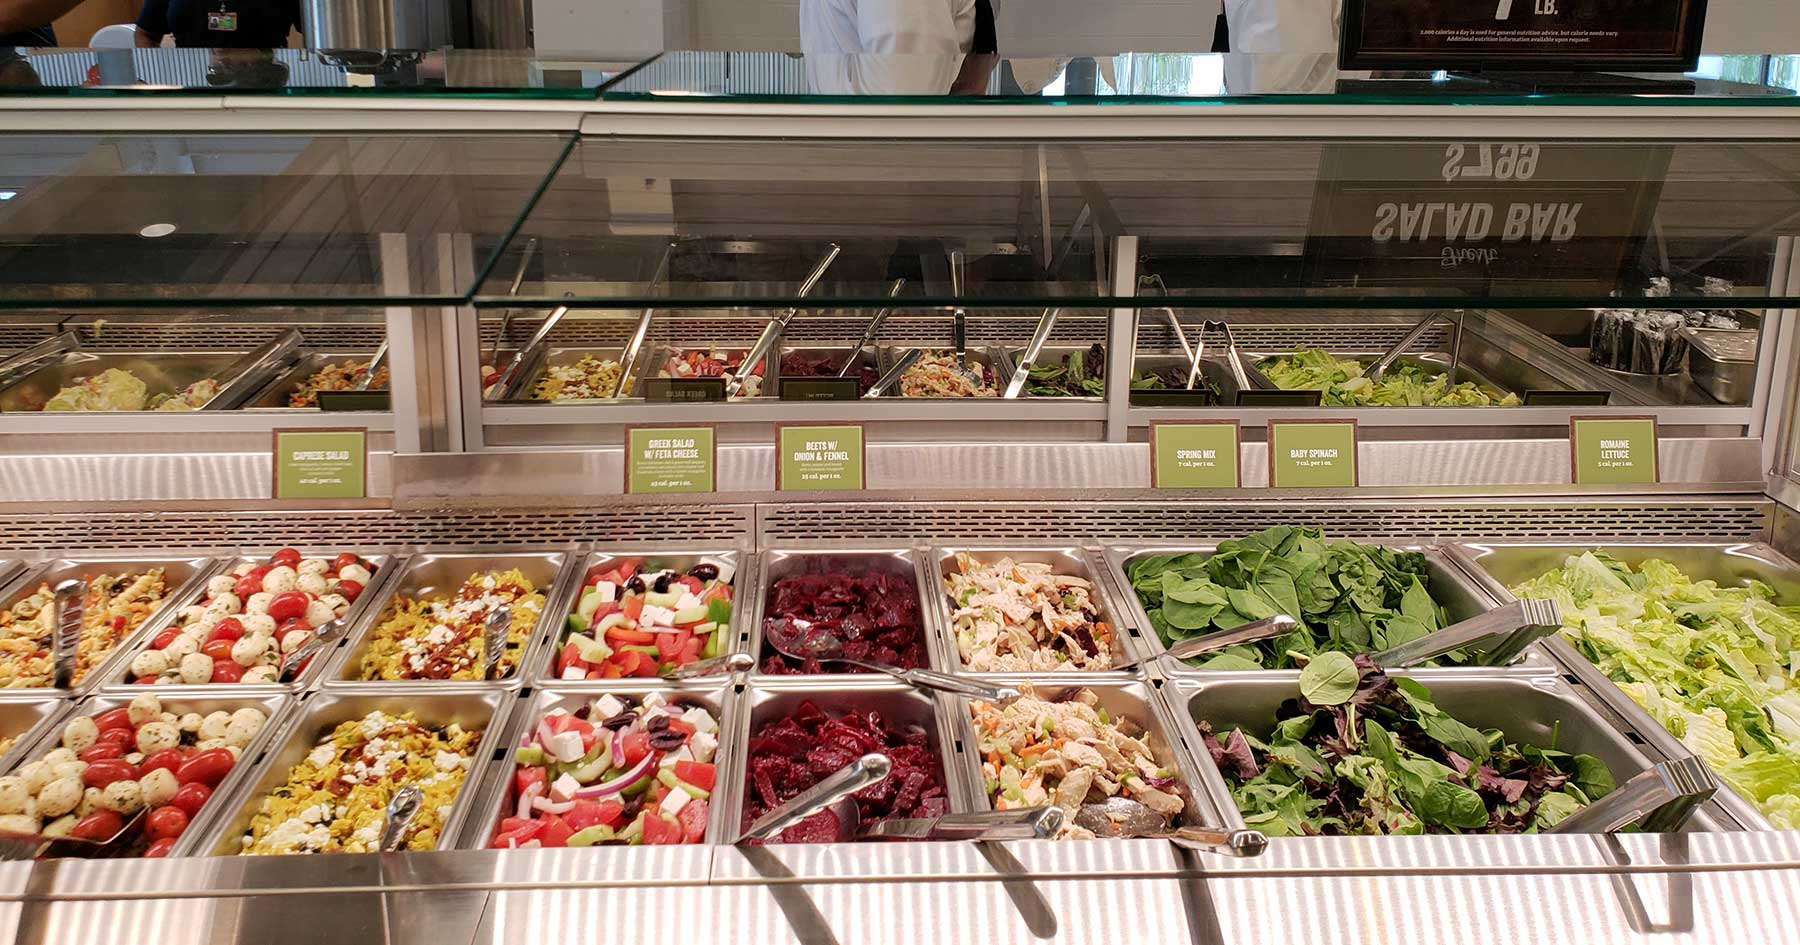 sprouts salad bar